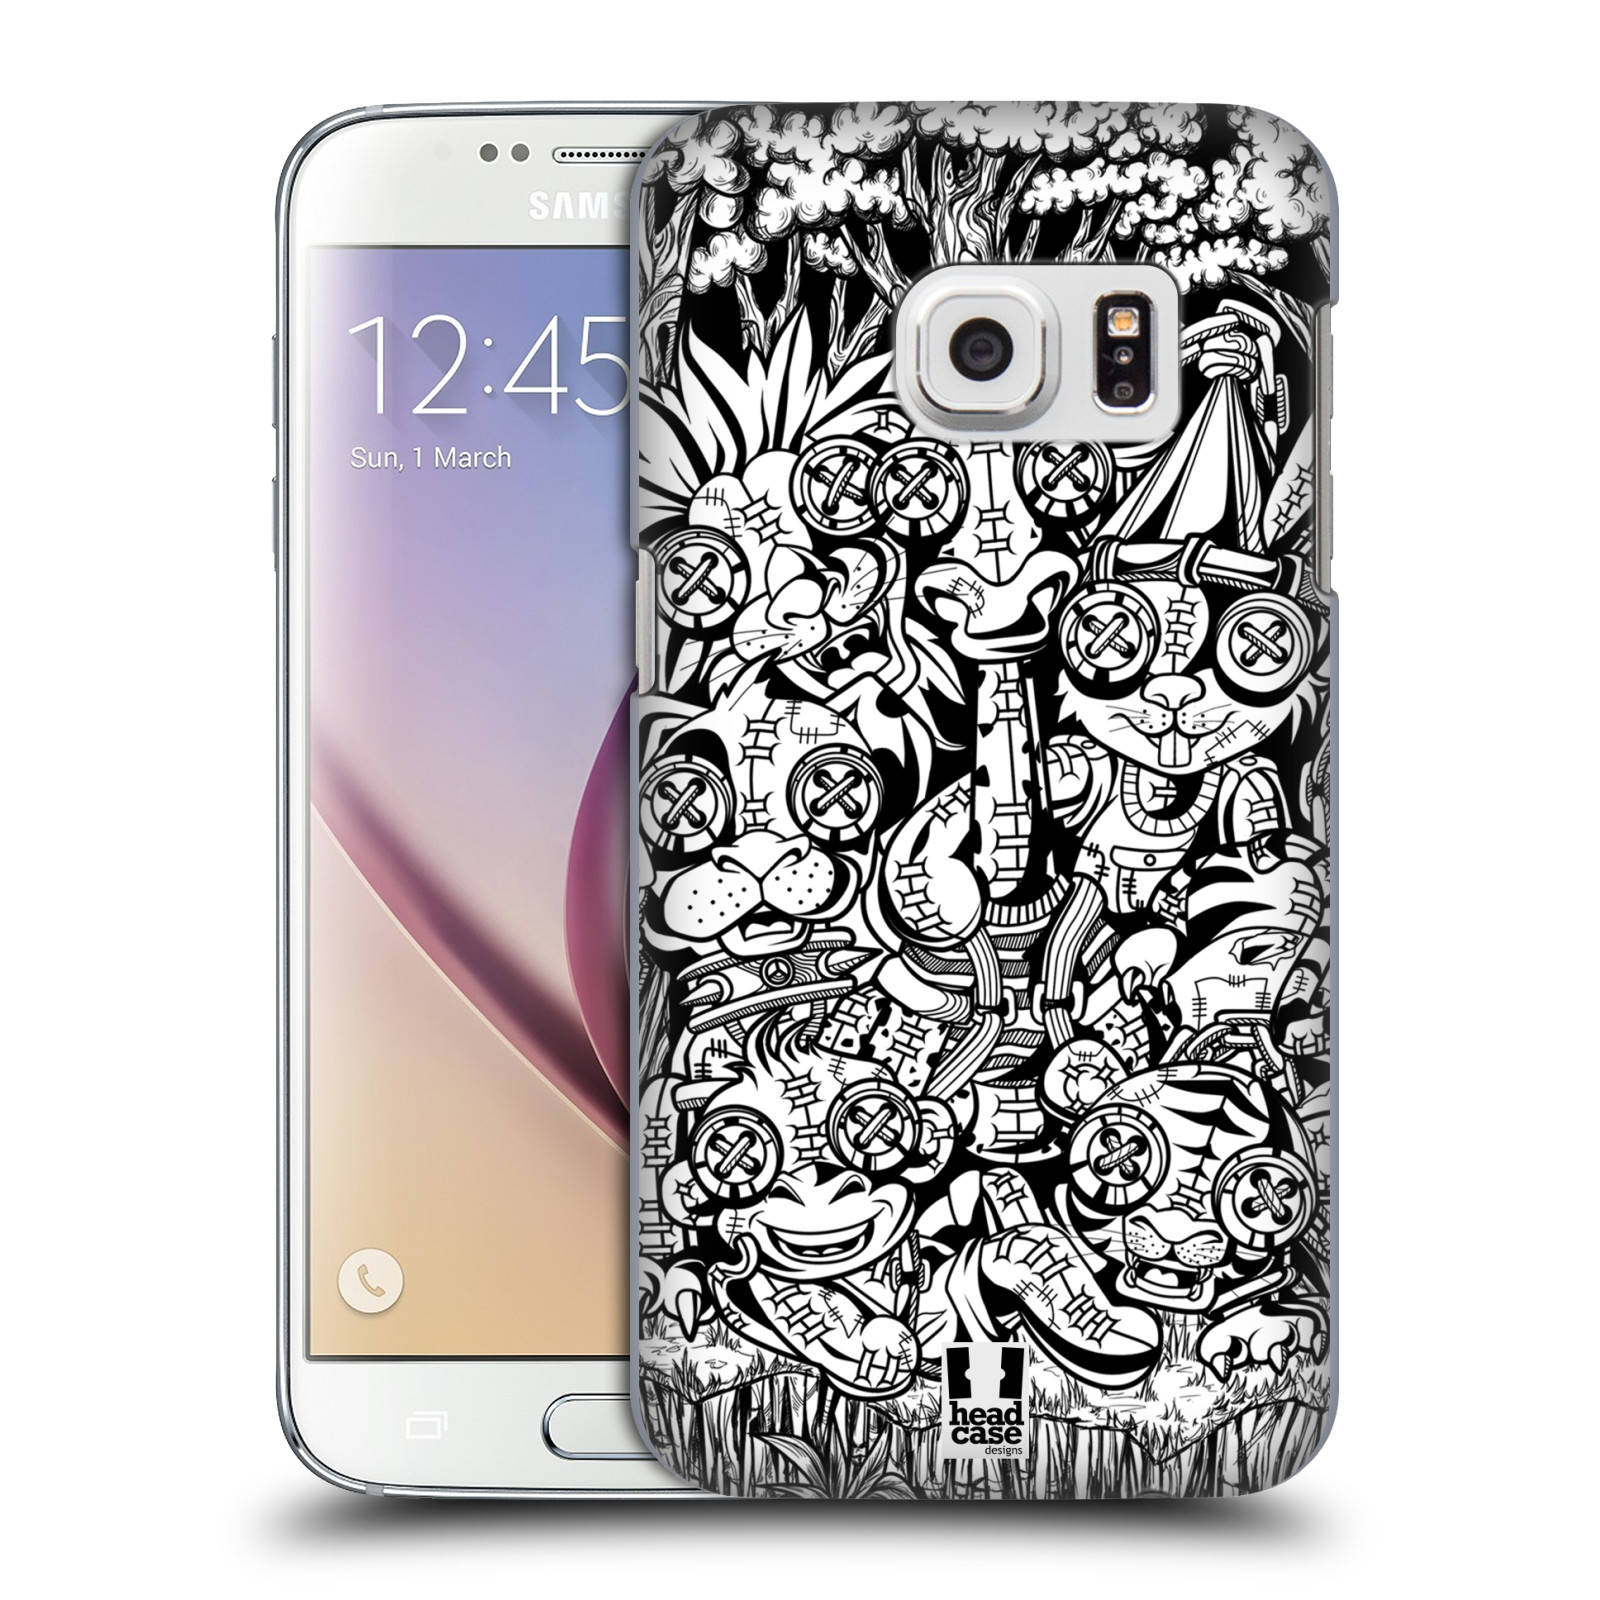 Plastové pouzdro na mobil Samsung Galaxy S7 HEAD CASE VOODOO ZVÍŘÁTKA (Kryt či obal na mobilní telefon Samsung Galaxy S7 SM-G930F)